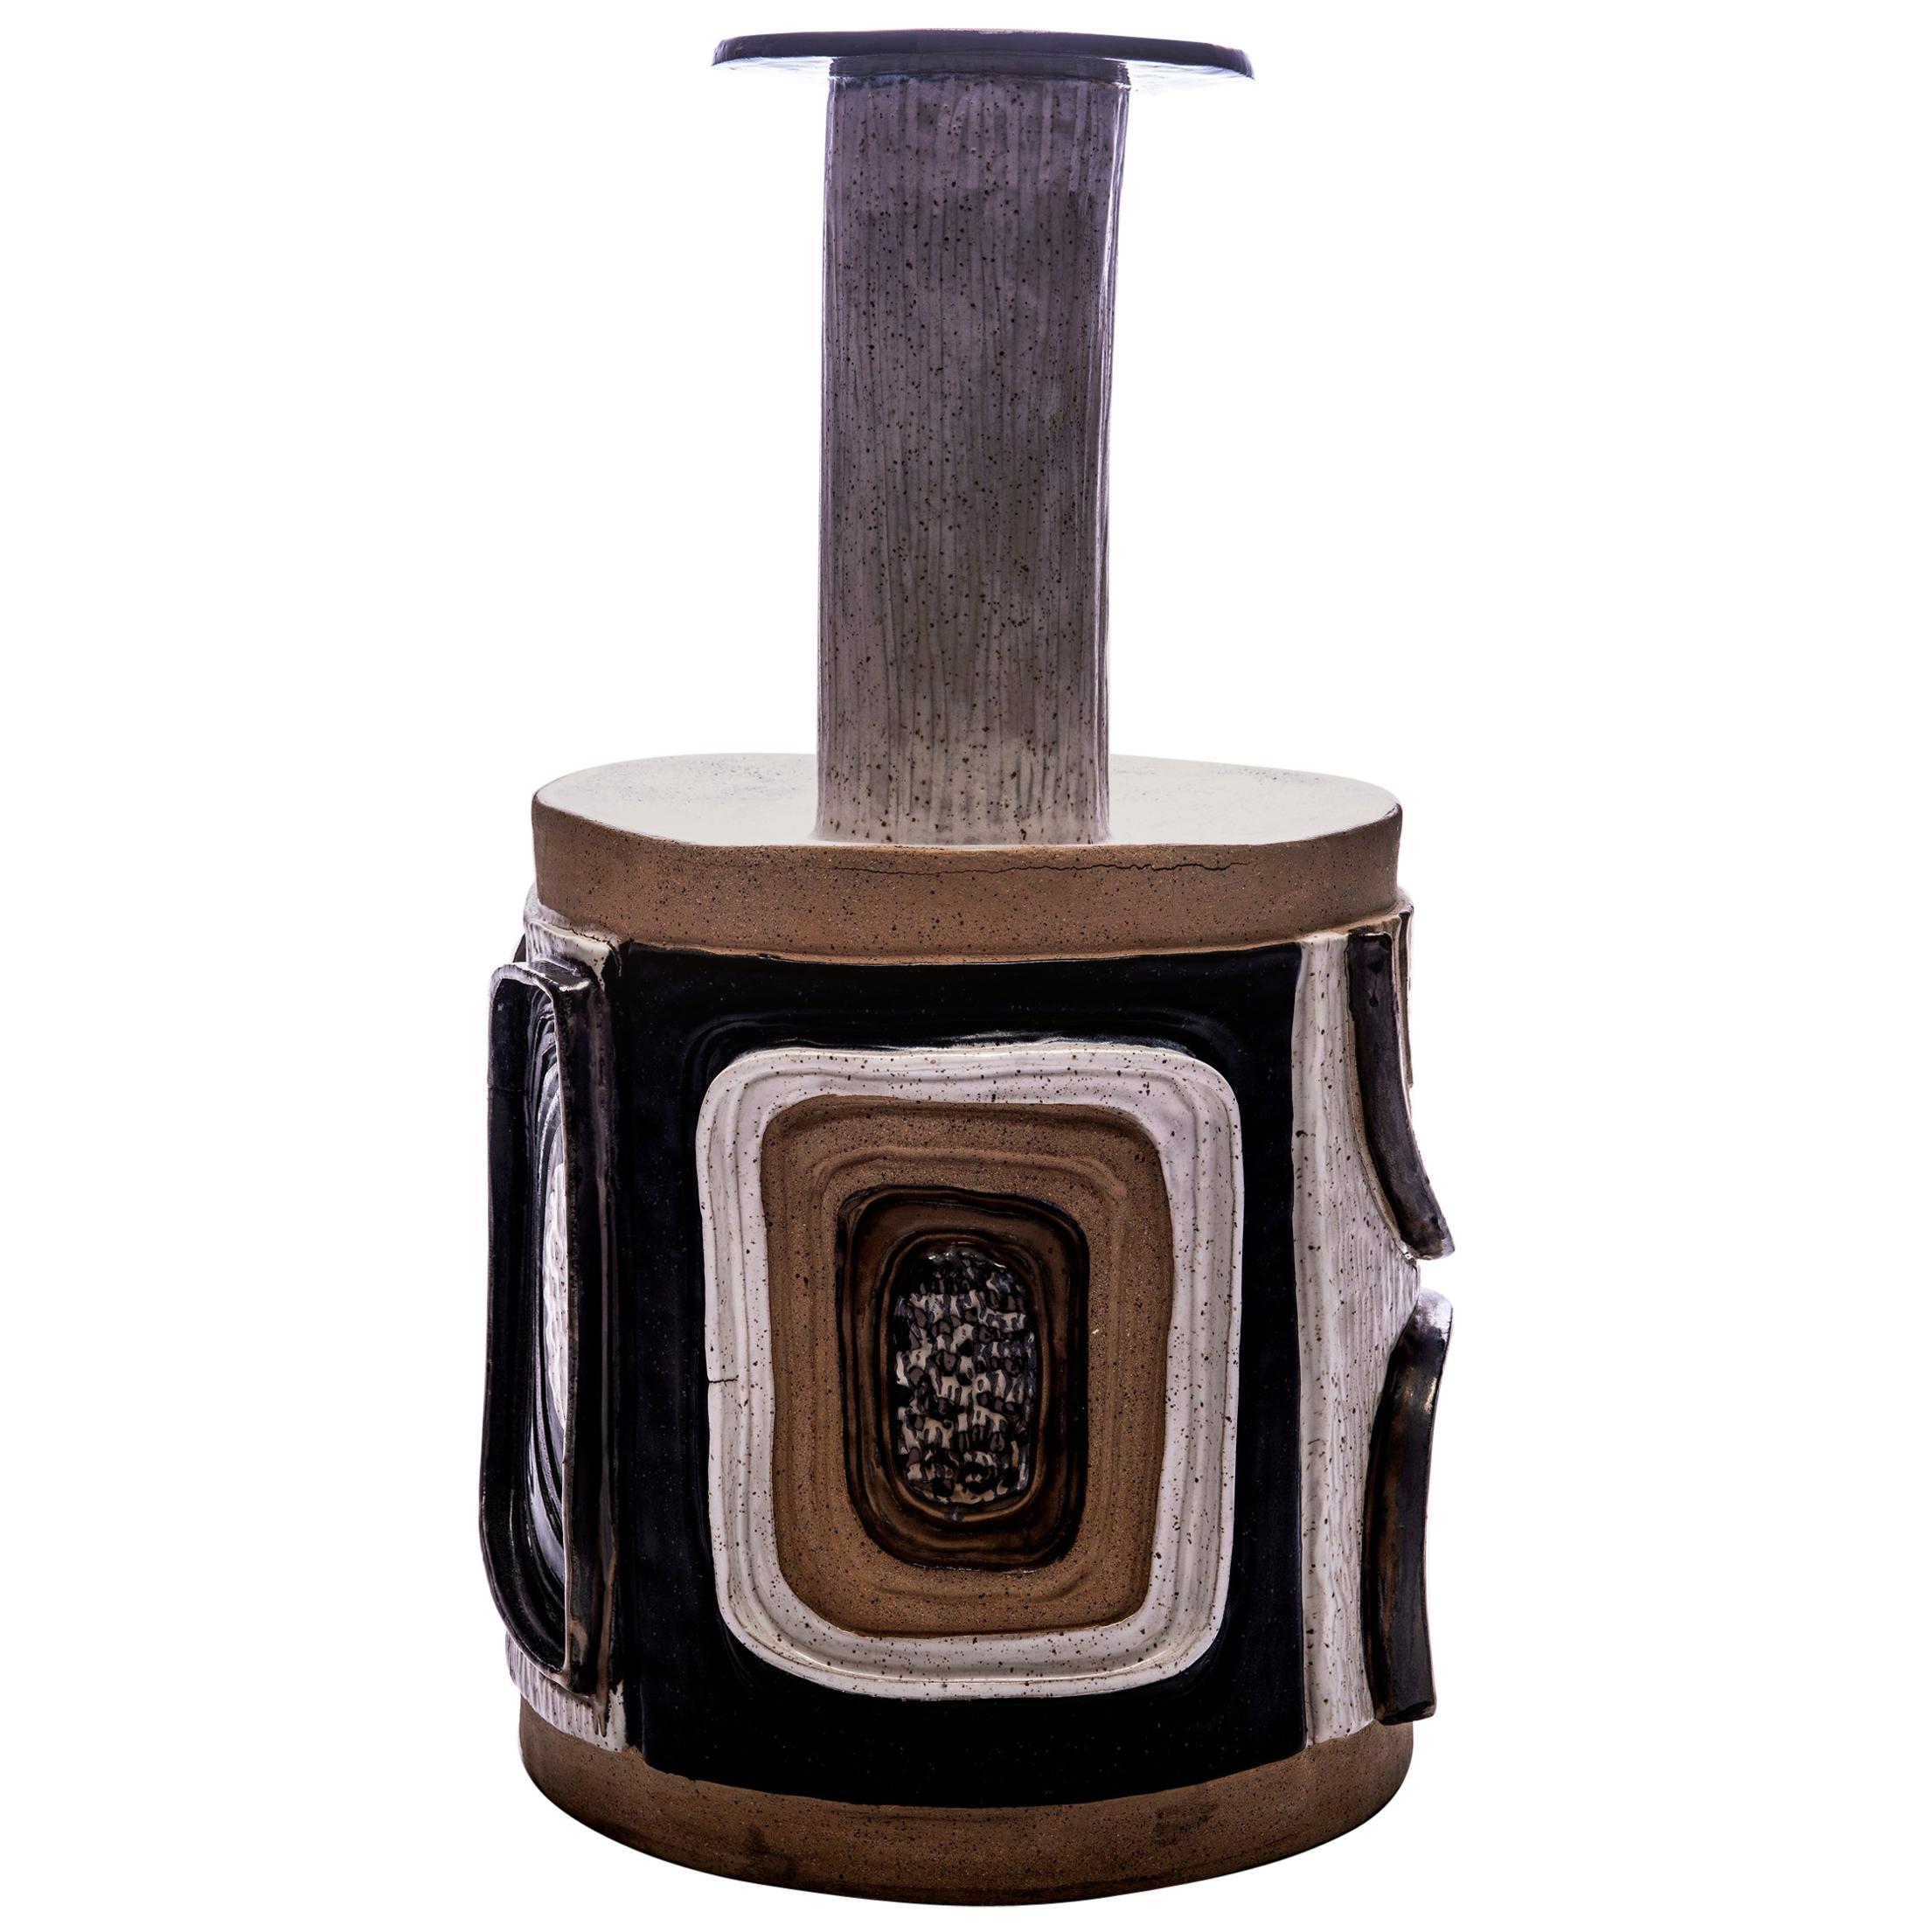 """Aldo"" Glazed Ceramic Vessel, Moderno Collection"